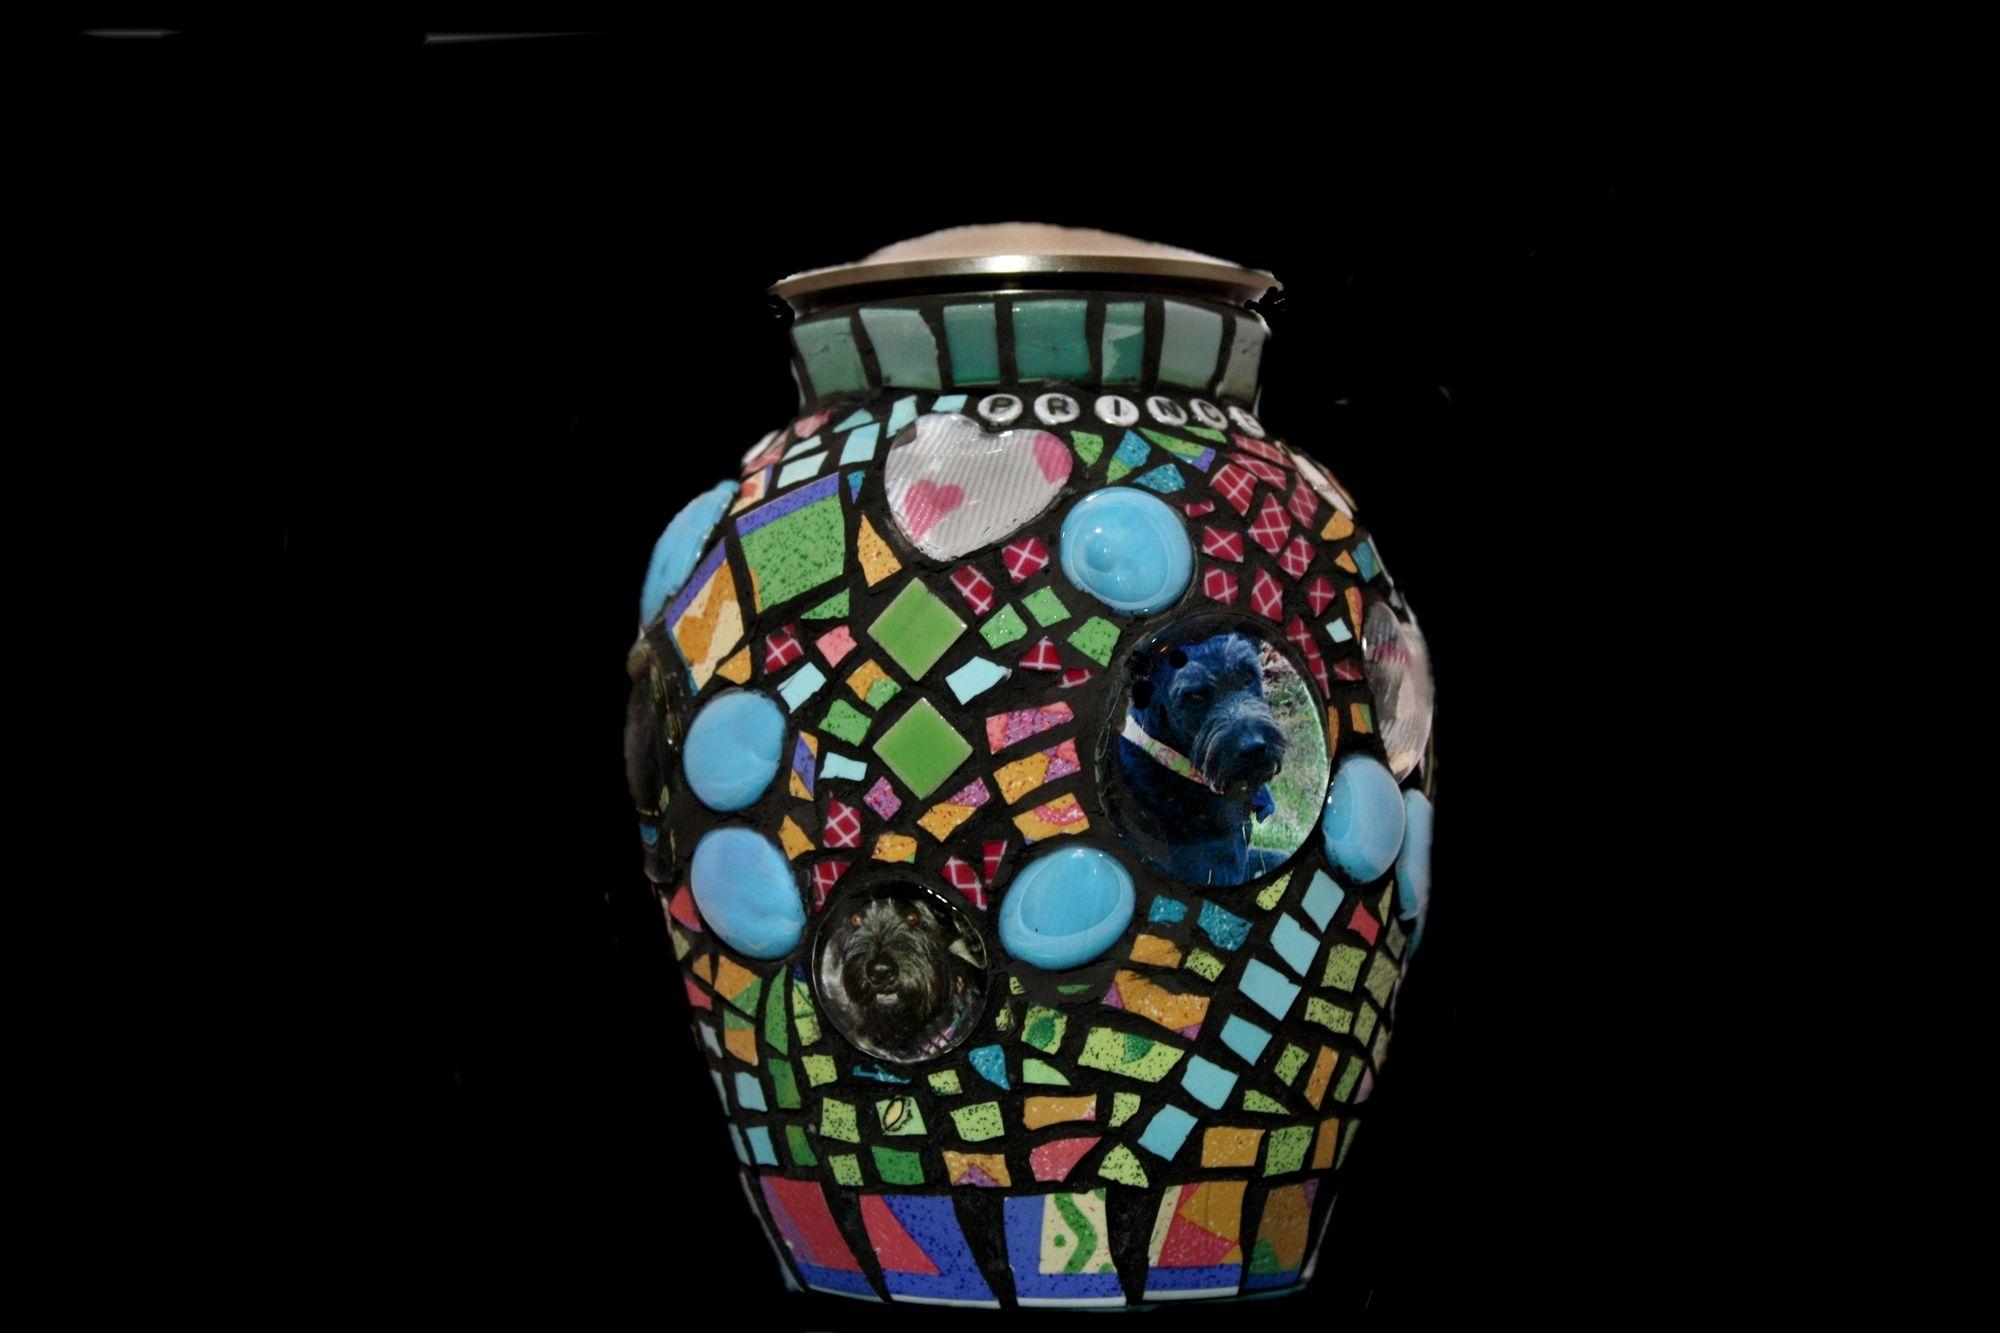 Pet Memorial - Handcrafted Mosaic Memorial Urns for Pets | Mosaic ...